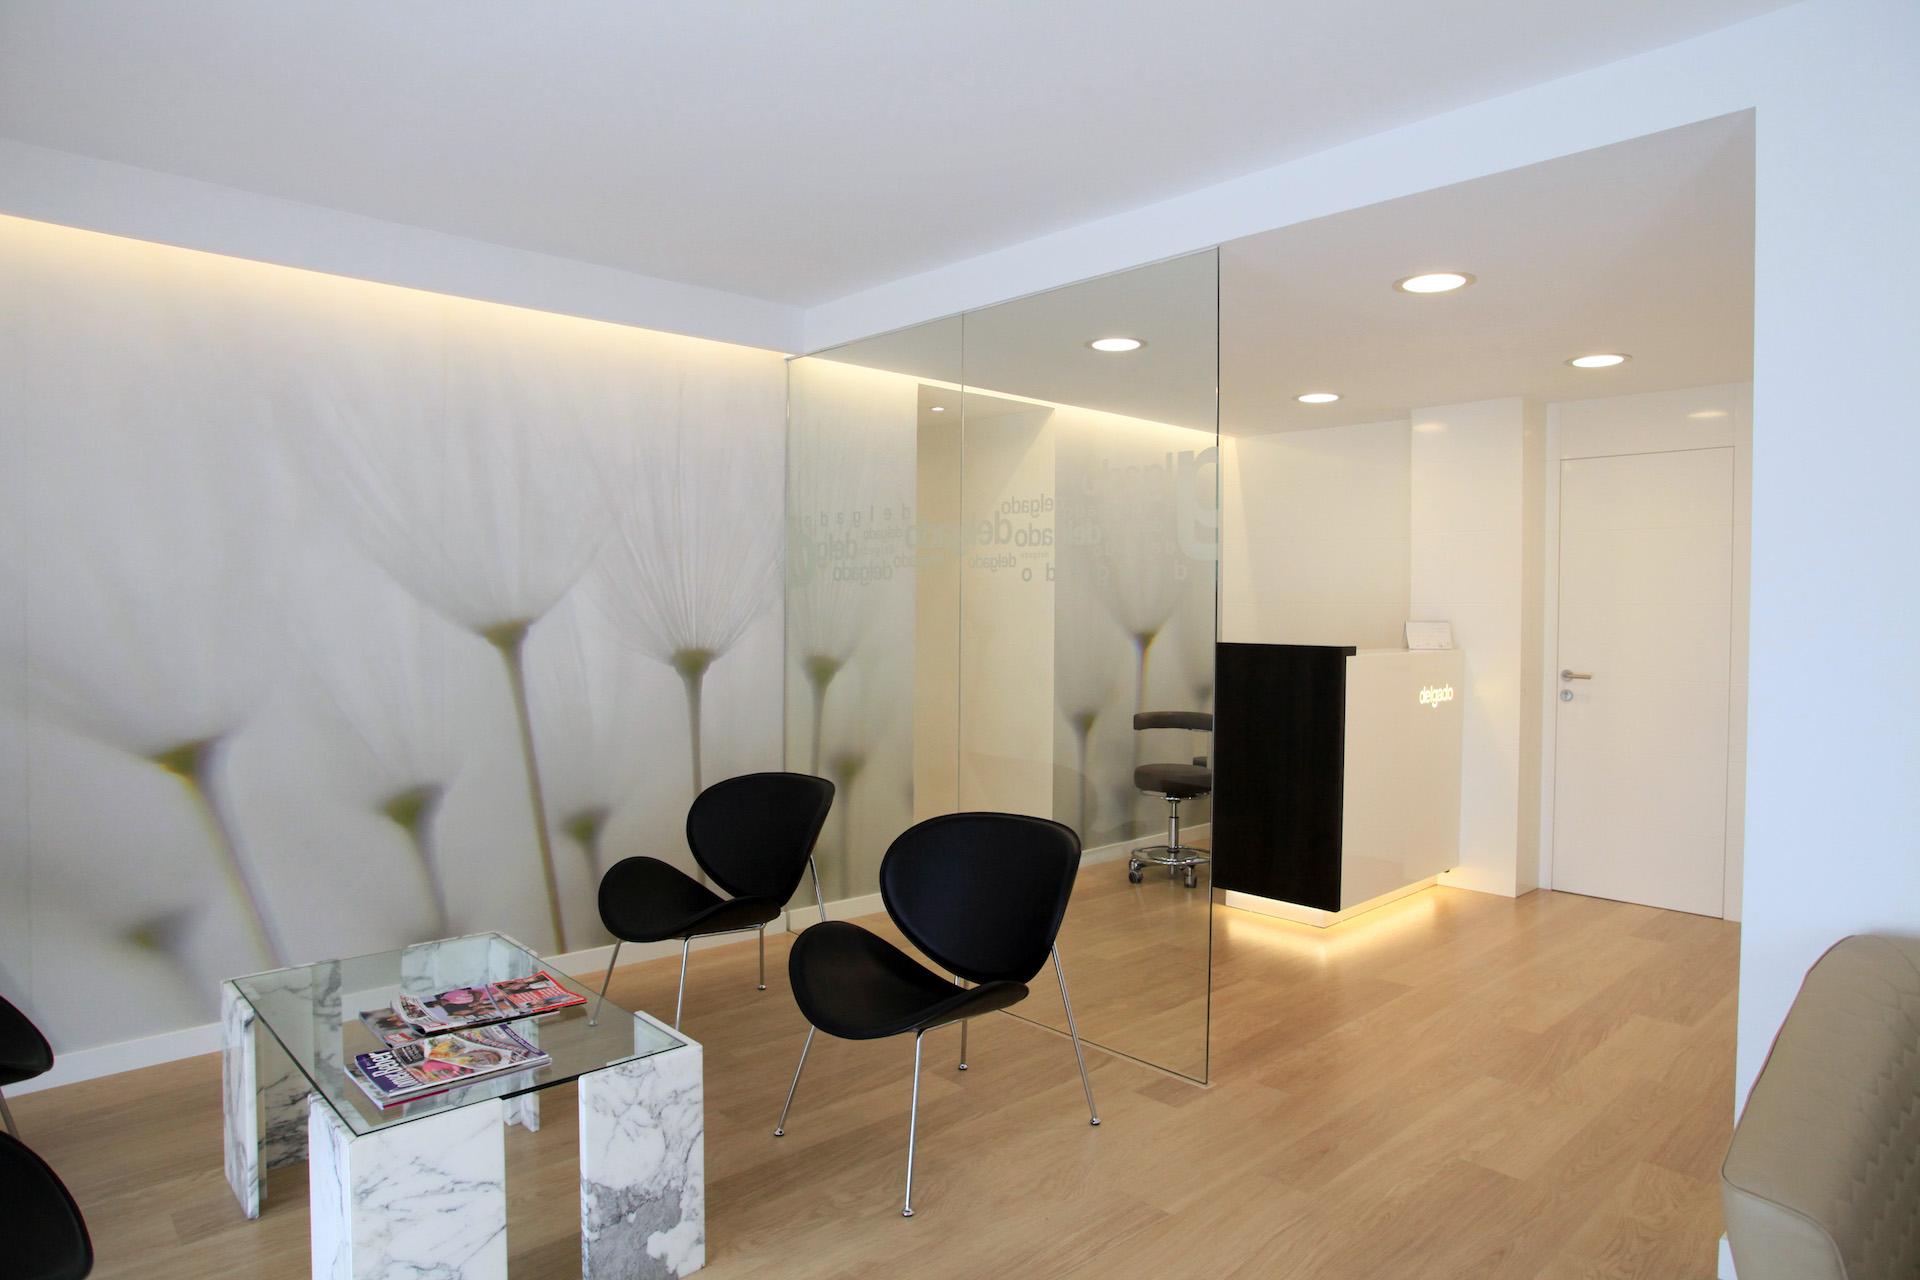 Contract cl nica dental alibaz construcci n empresa - Empresas de construccion en mallorca ...